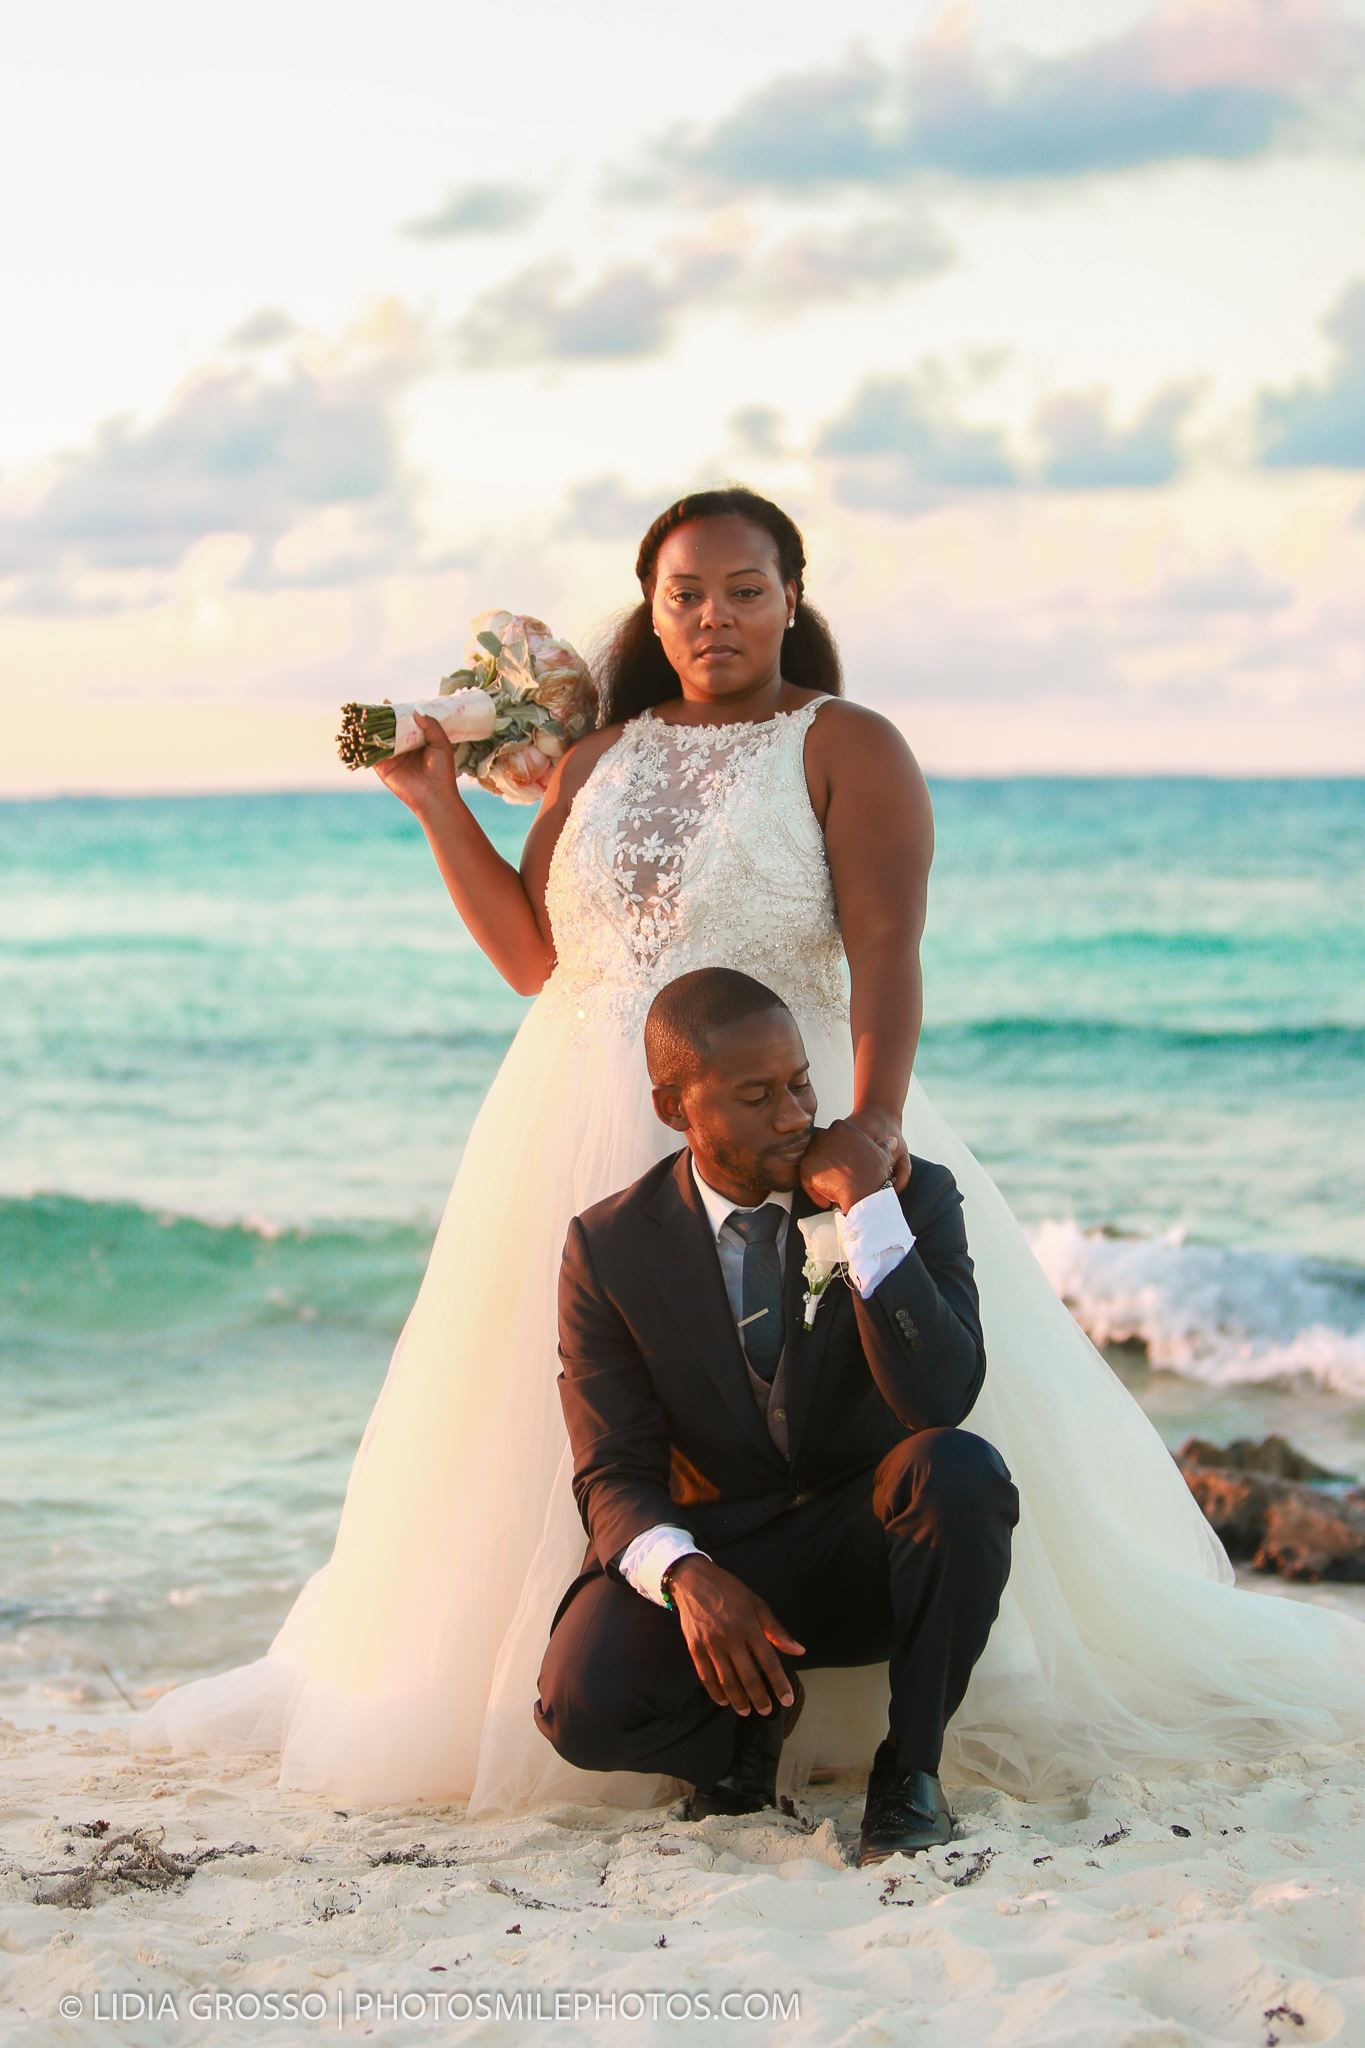 cancun wedding photos, a day after session photos, Hyatt Ziva Cancun wedding photographer, best beach wedding photos